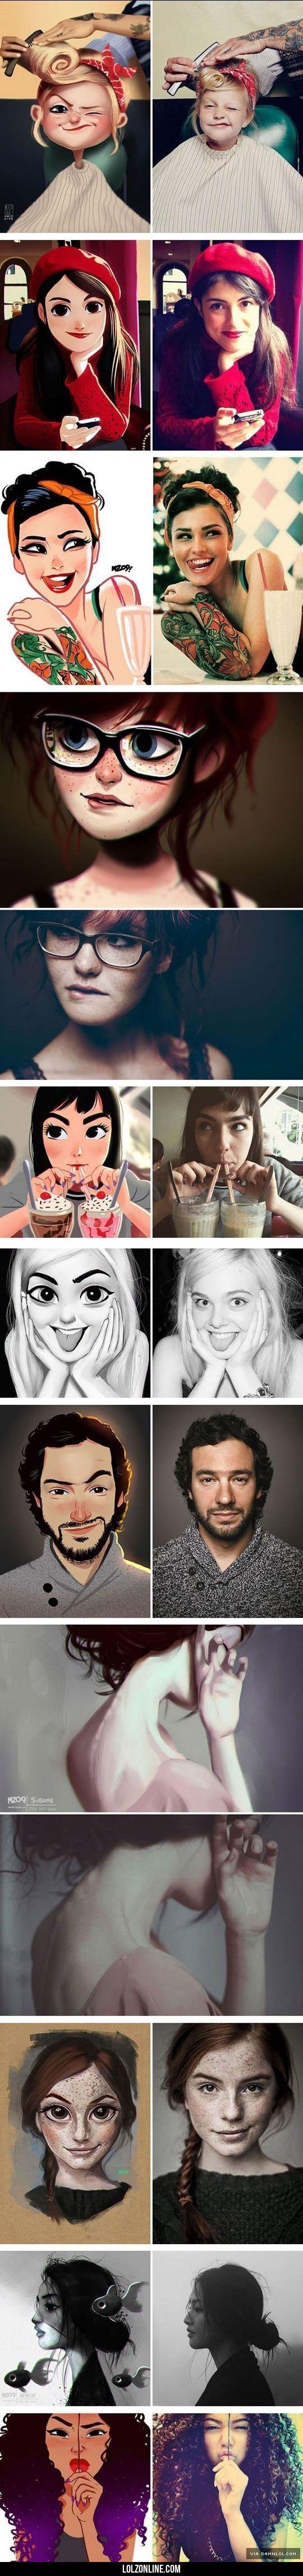 Artist Turns Photos Of Random People Into Fun Illustrations#funny #lol #lolzonline